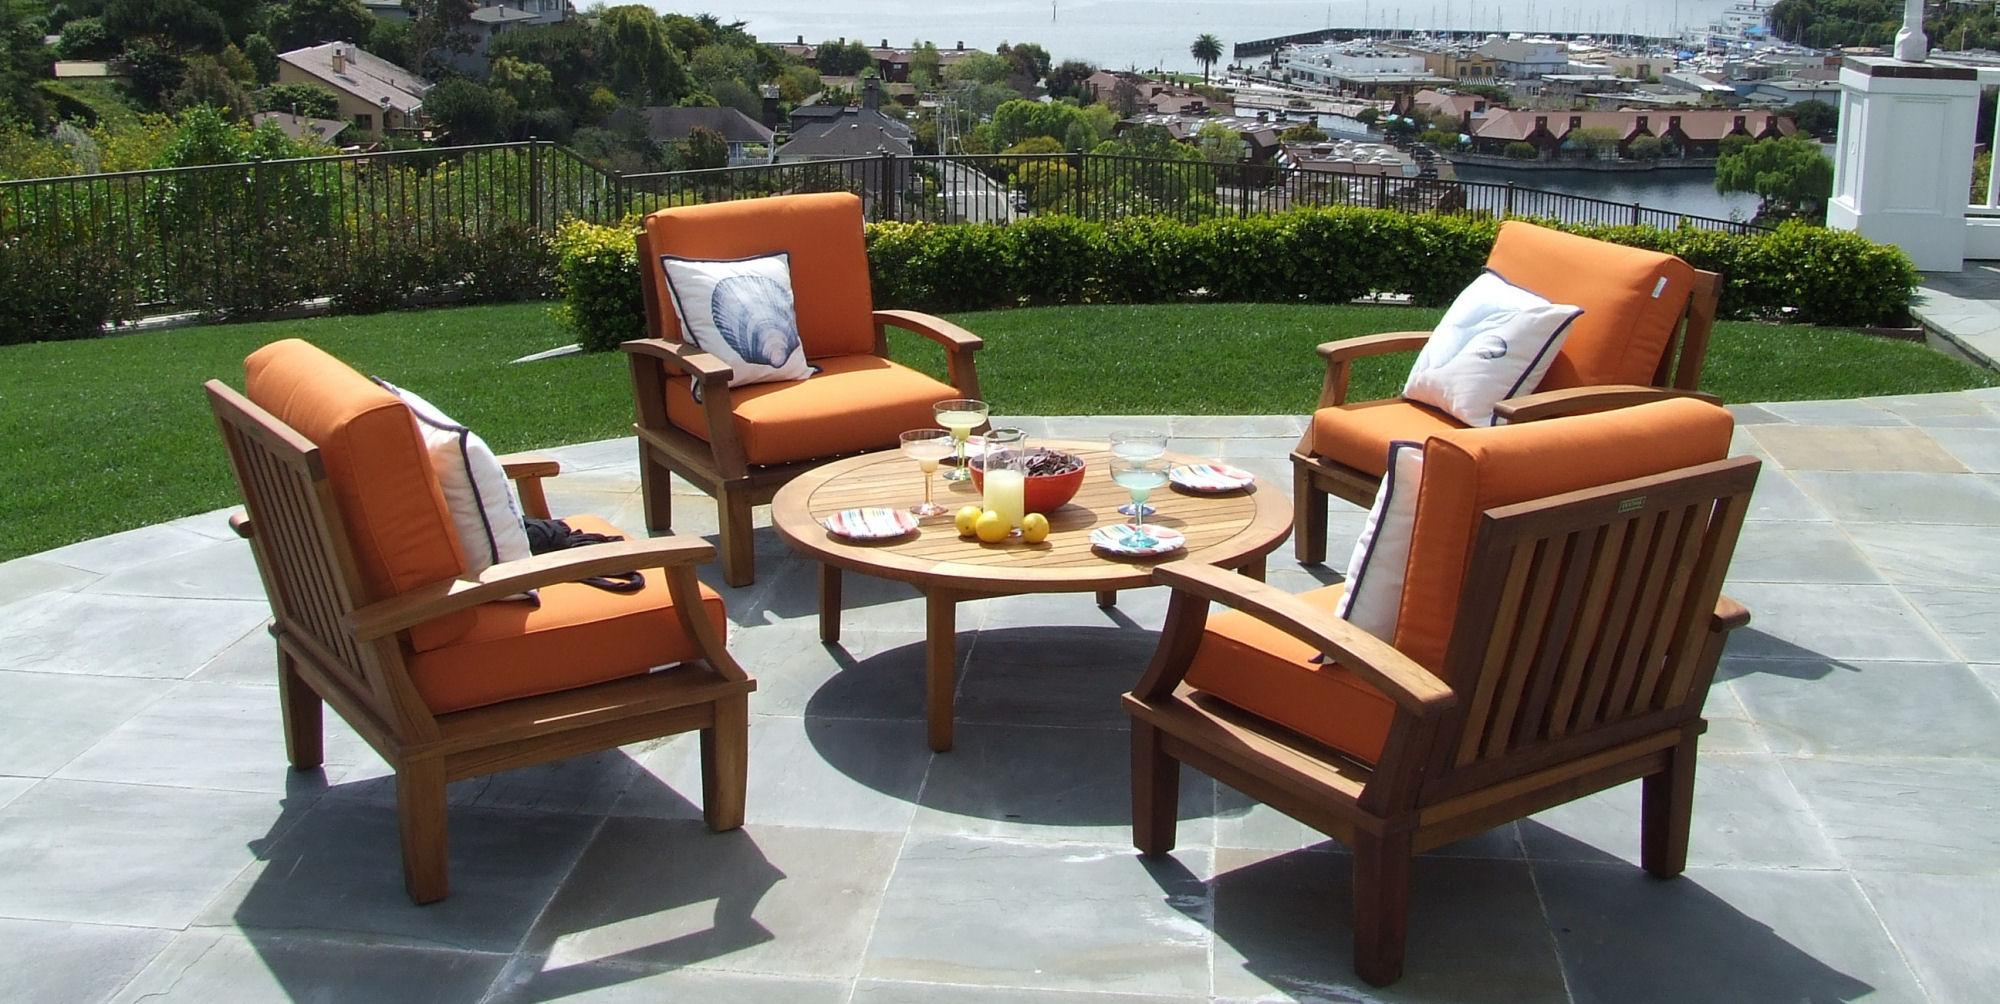 Custom Wholesale Teak Furniture Outdoor Patio Garden Pool